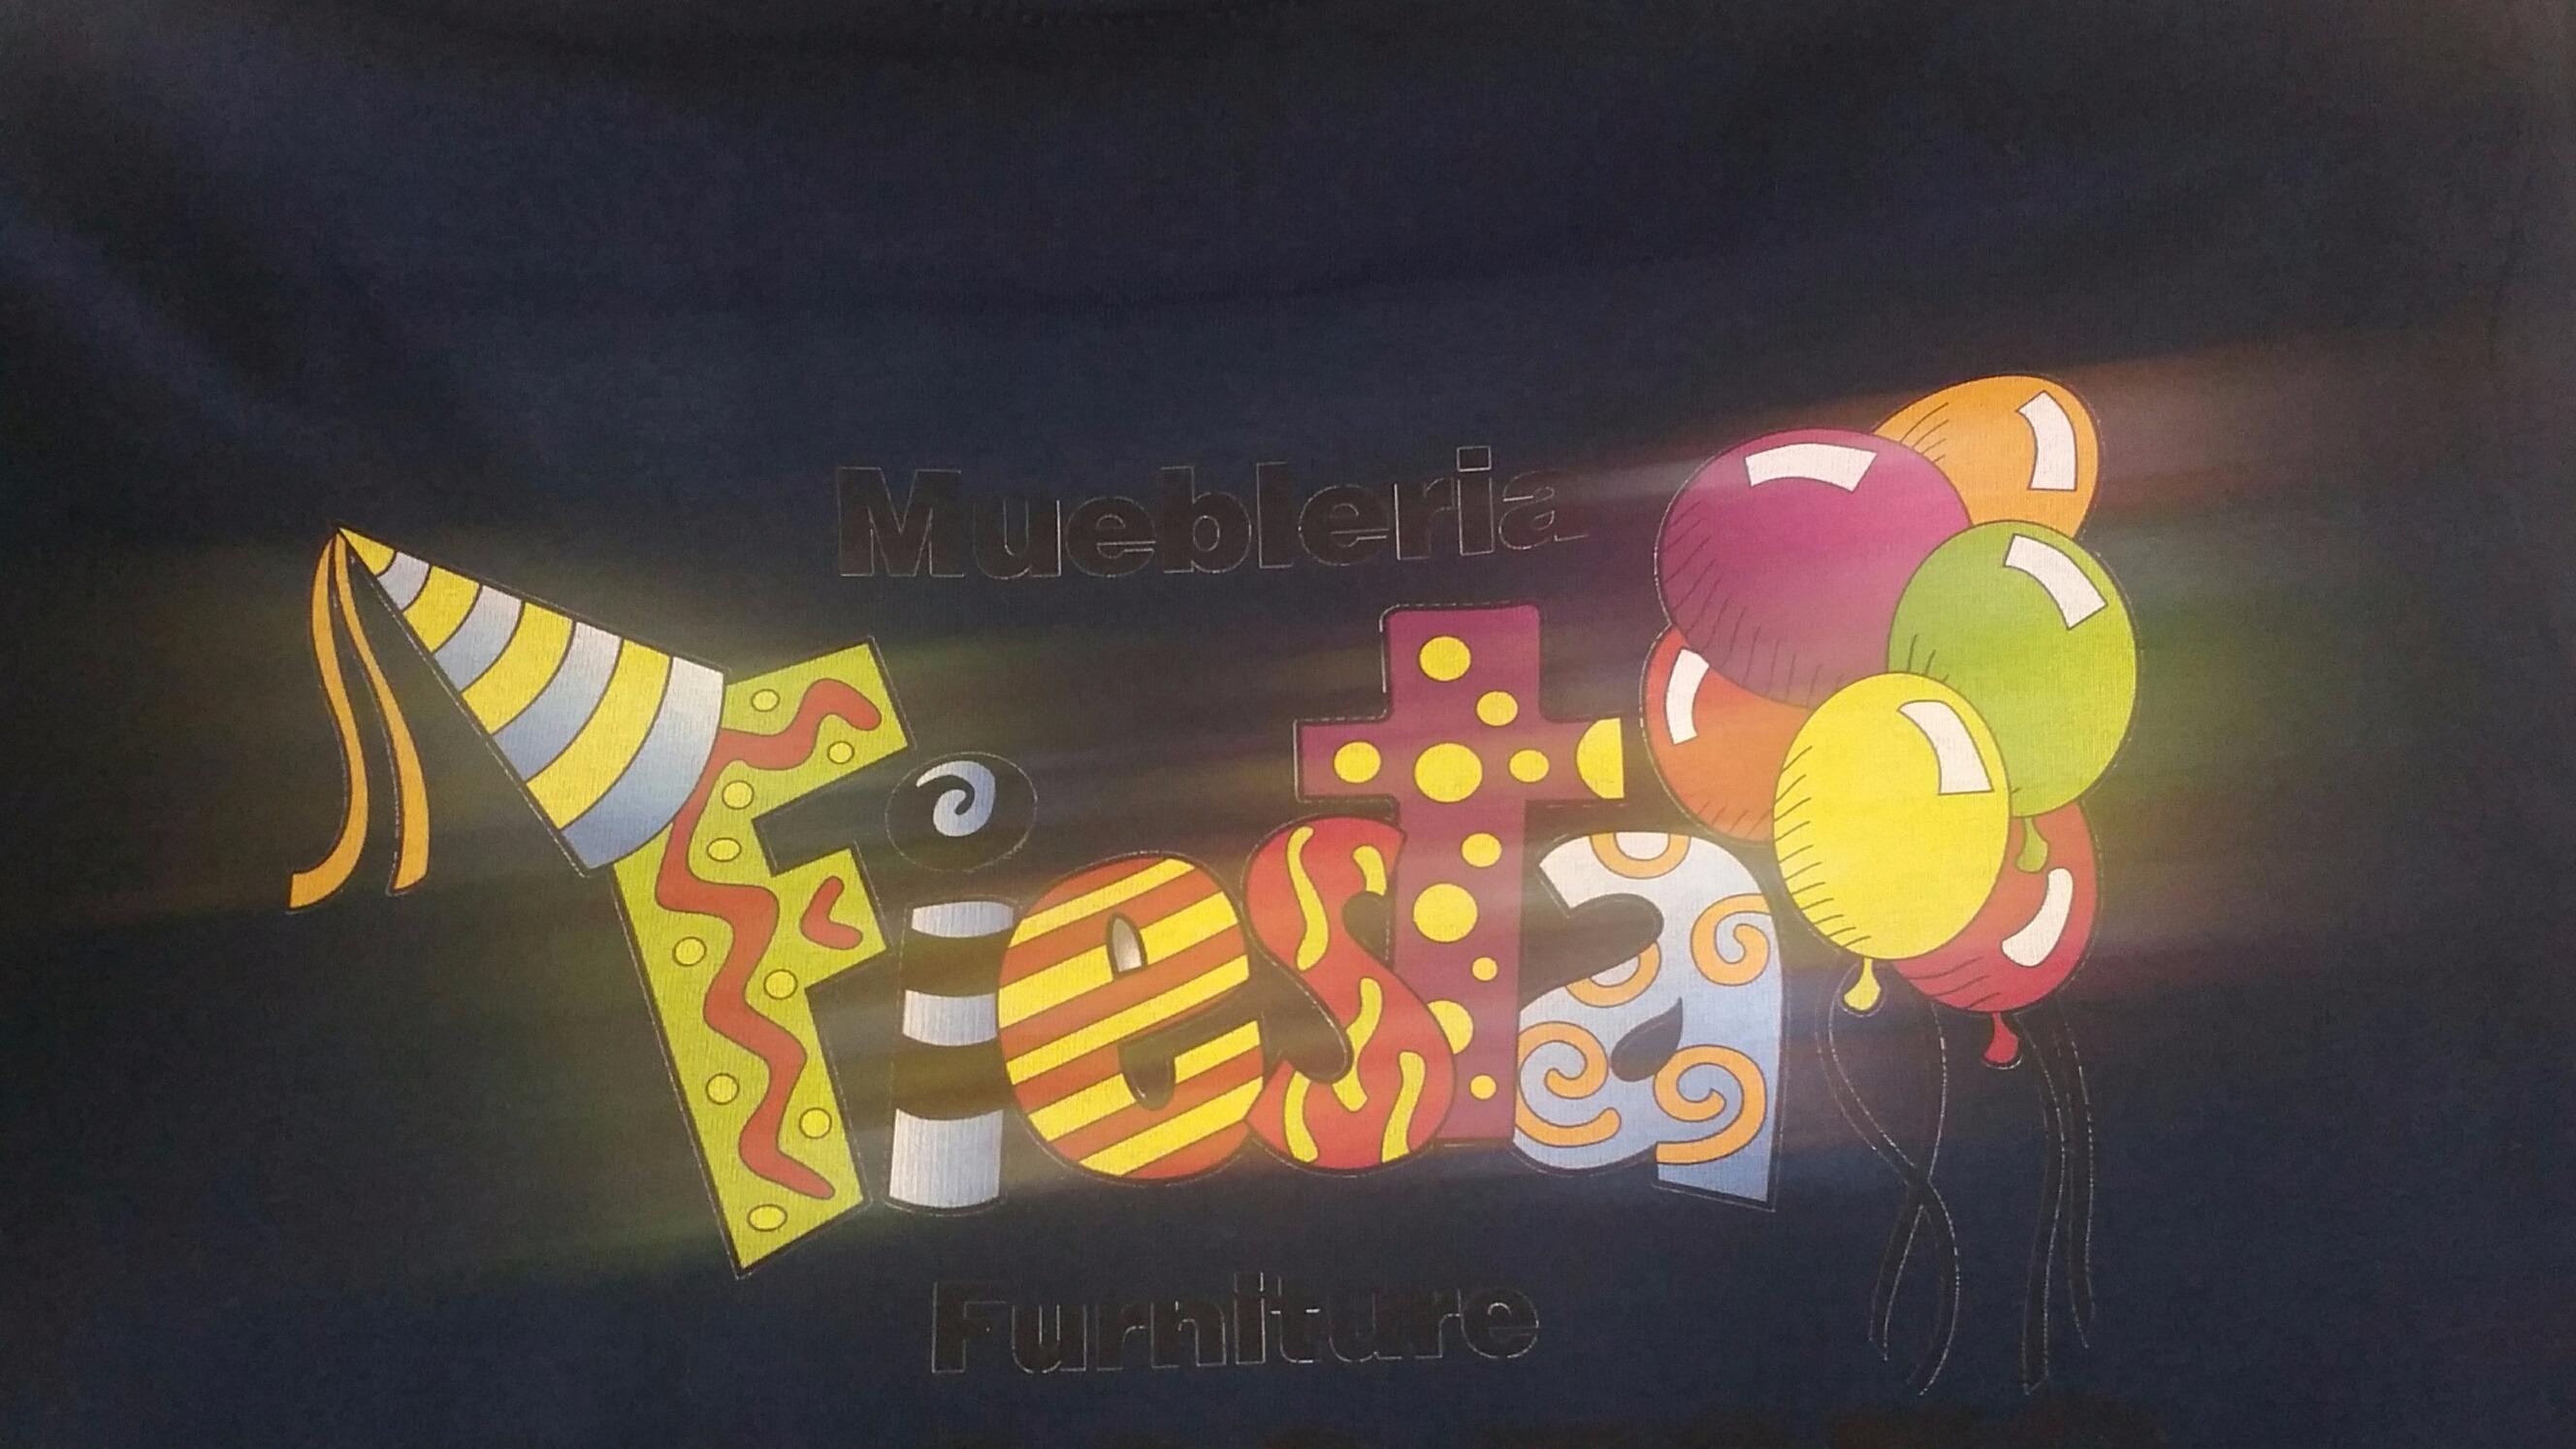 wholesale t shirts N image 18